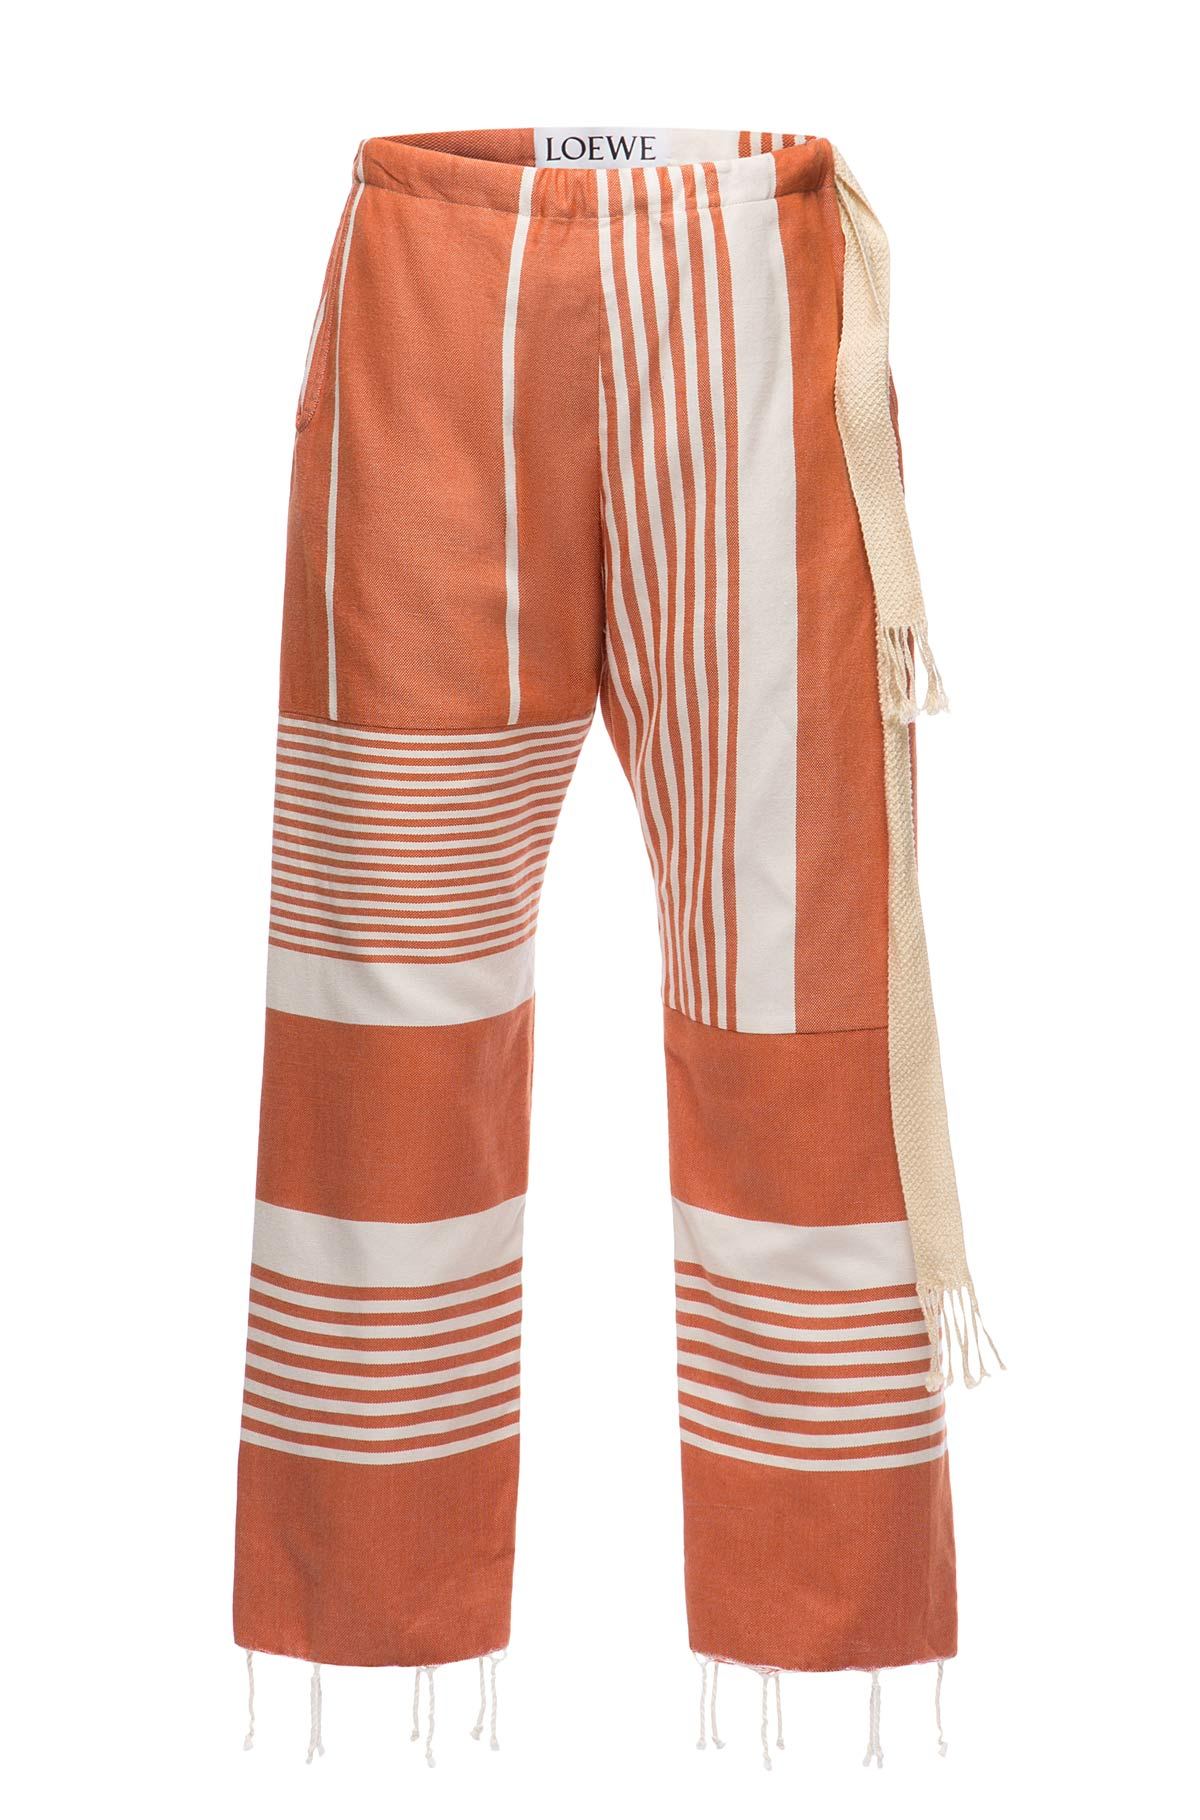 LOEWE Trousers Fouta Rojo/Blanco front